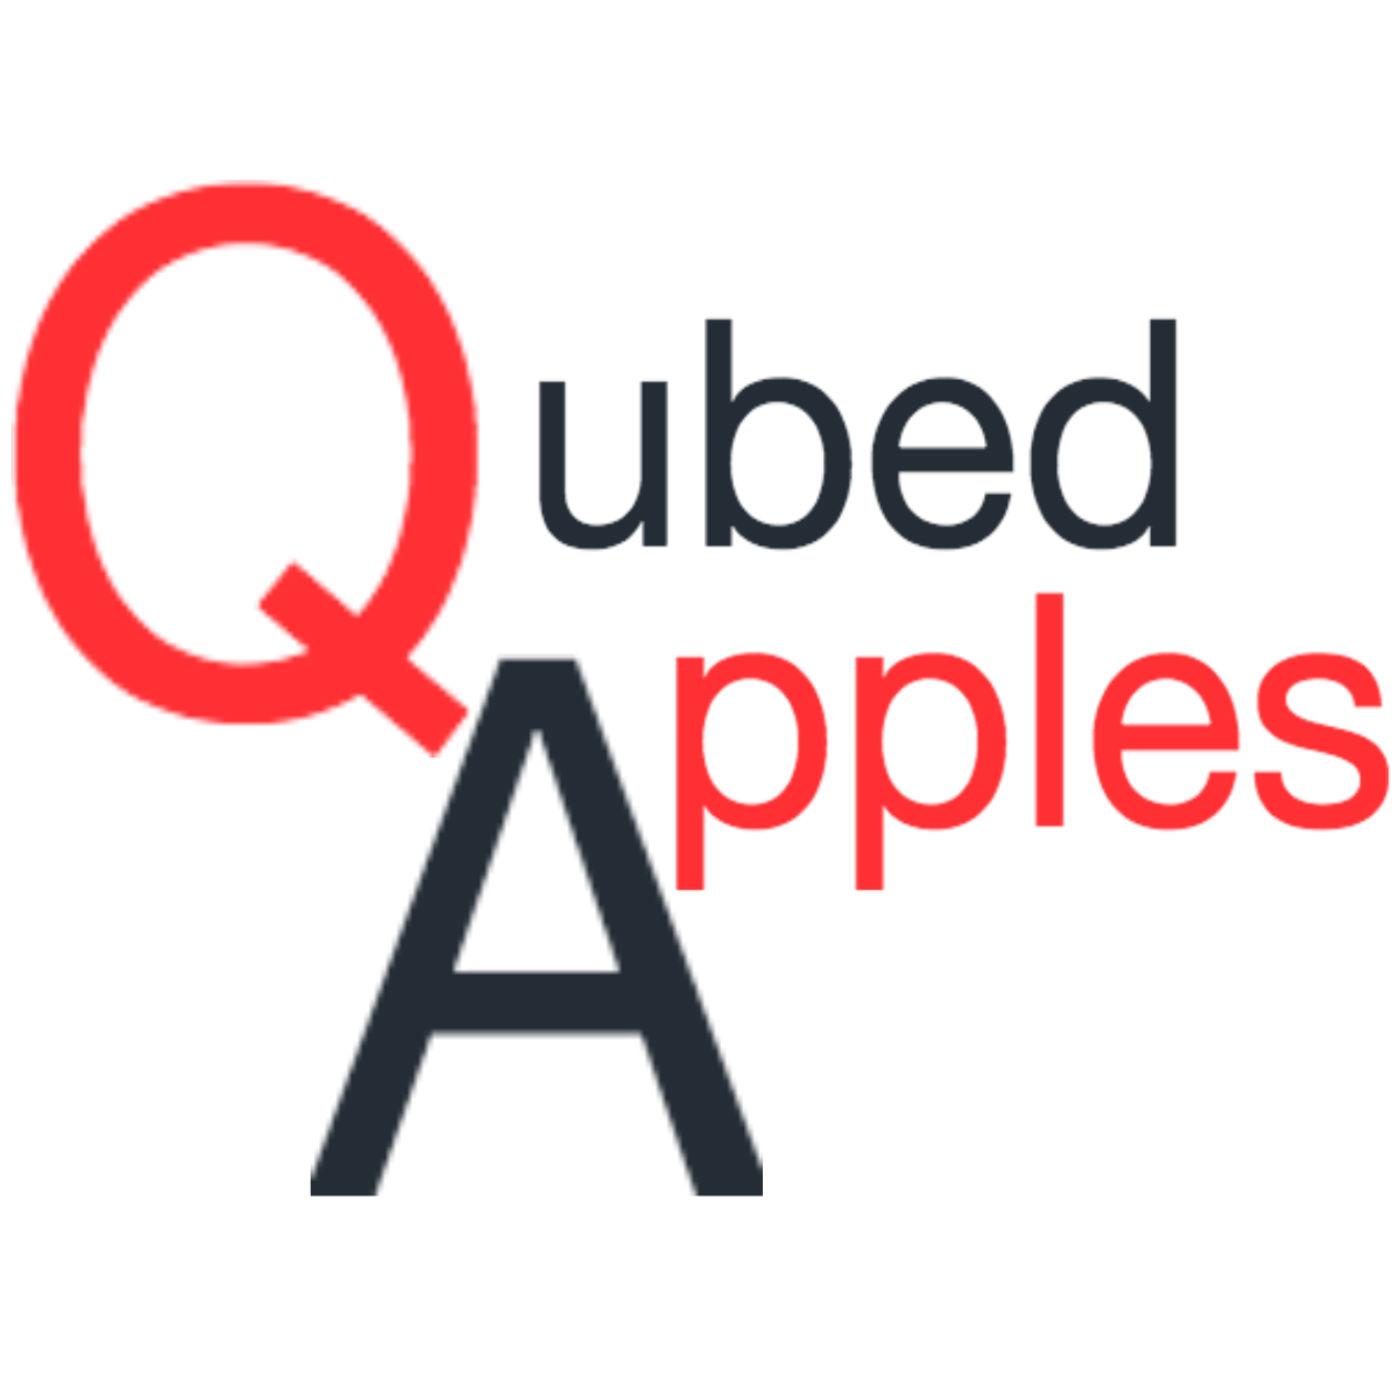 QubedApples